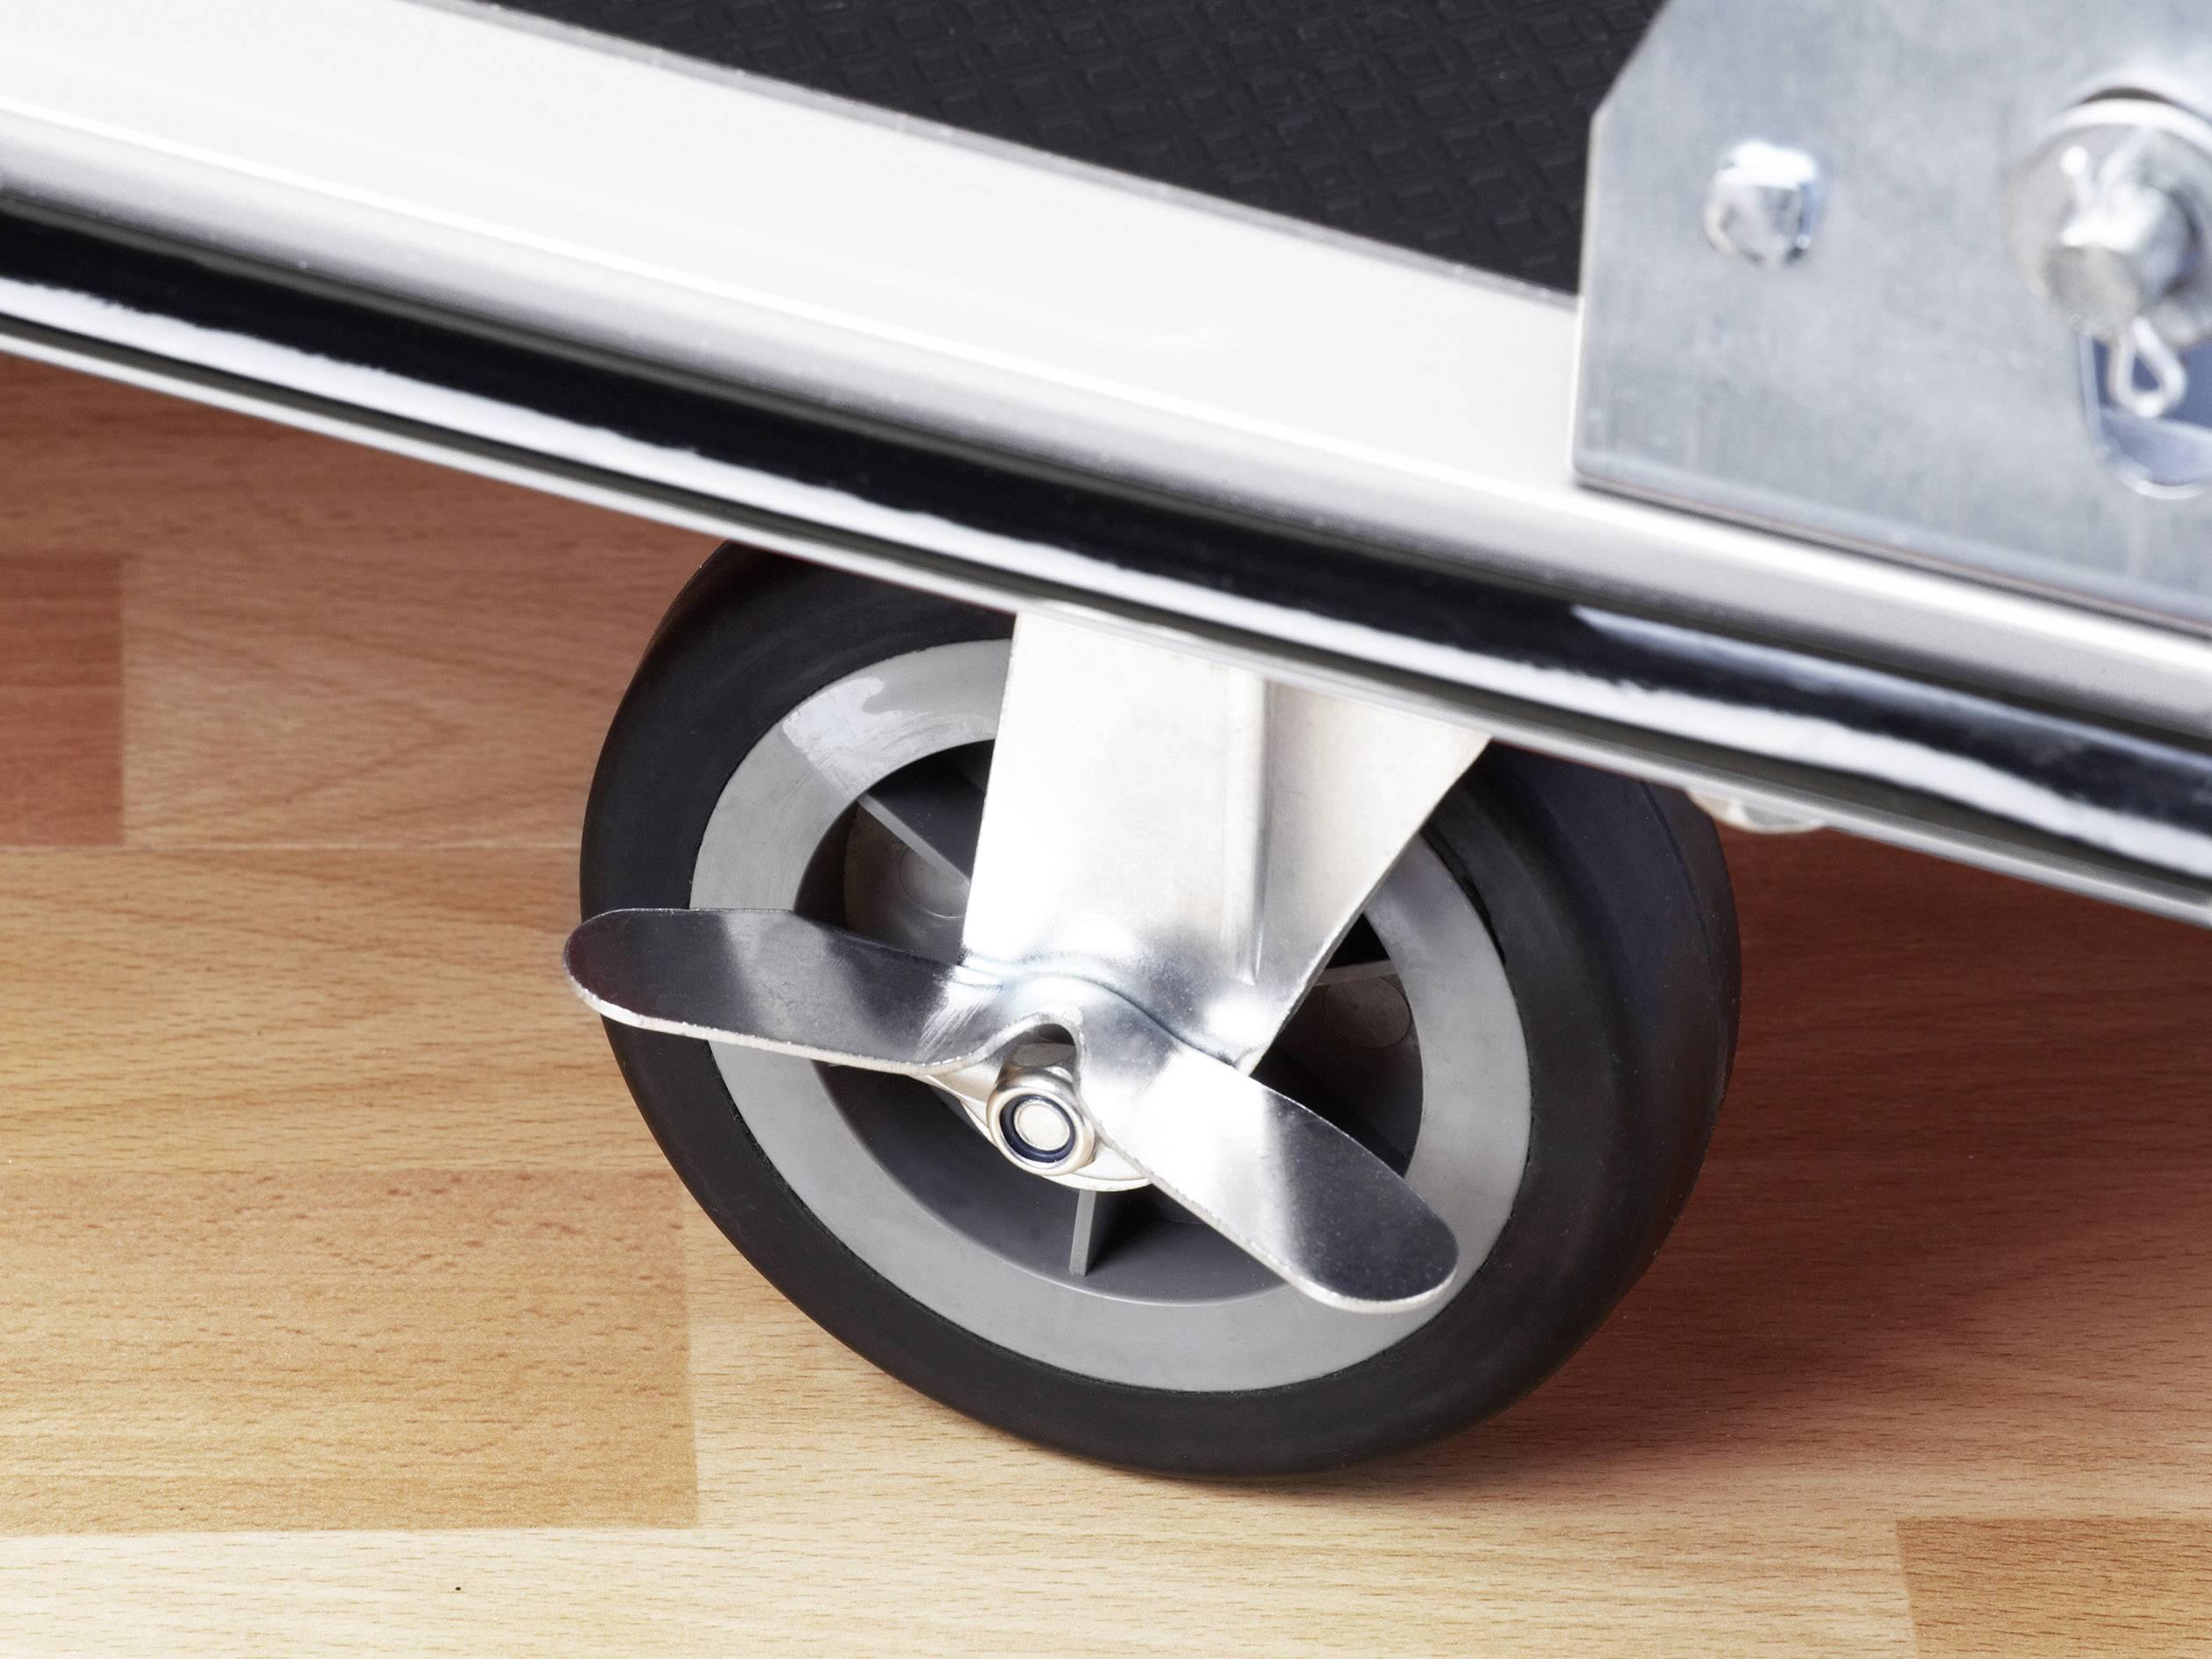 Plošinový vozík Cut-Off, nosnost 300 kg